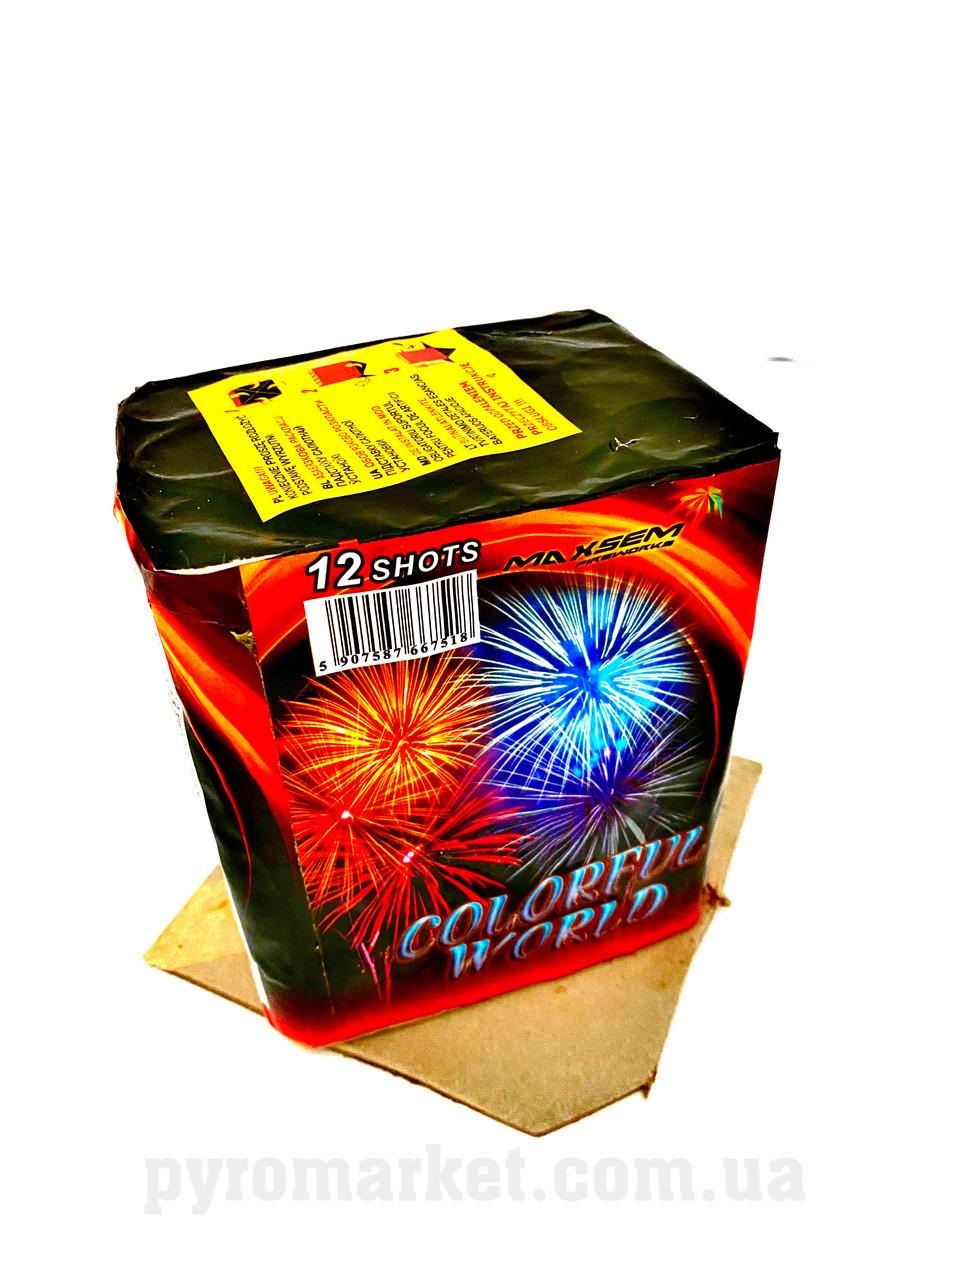 Салют Colorful World Maxsem GW218-93, 12 выстрелов 20 мм